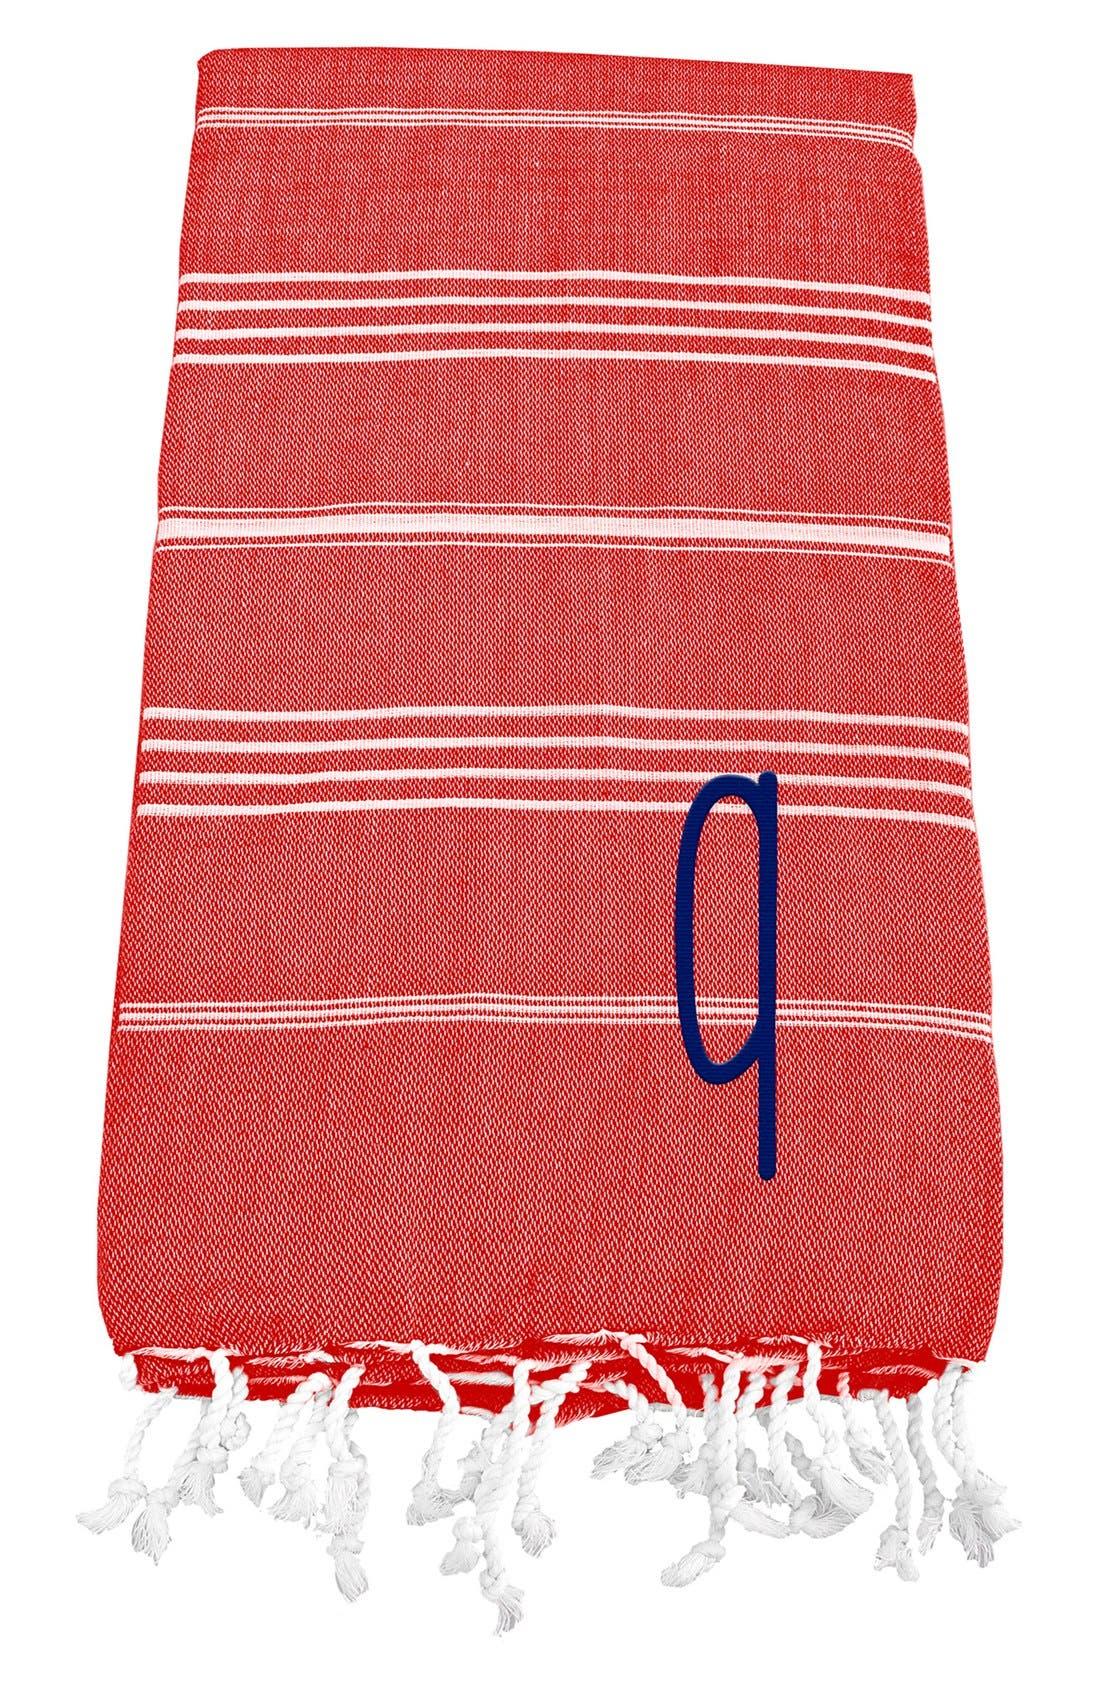 Monogram Turkish Cotton Towel,                         Main,                         color, Red - Q